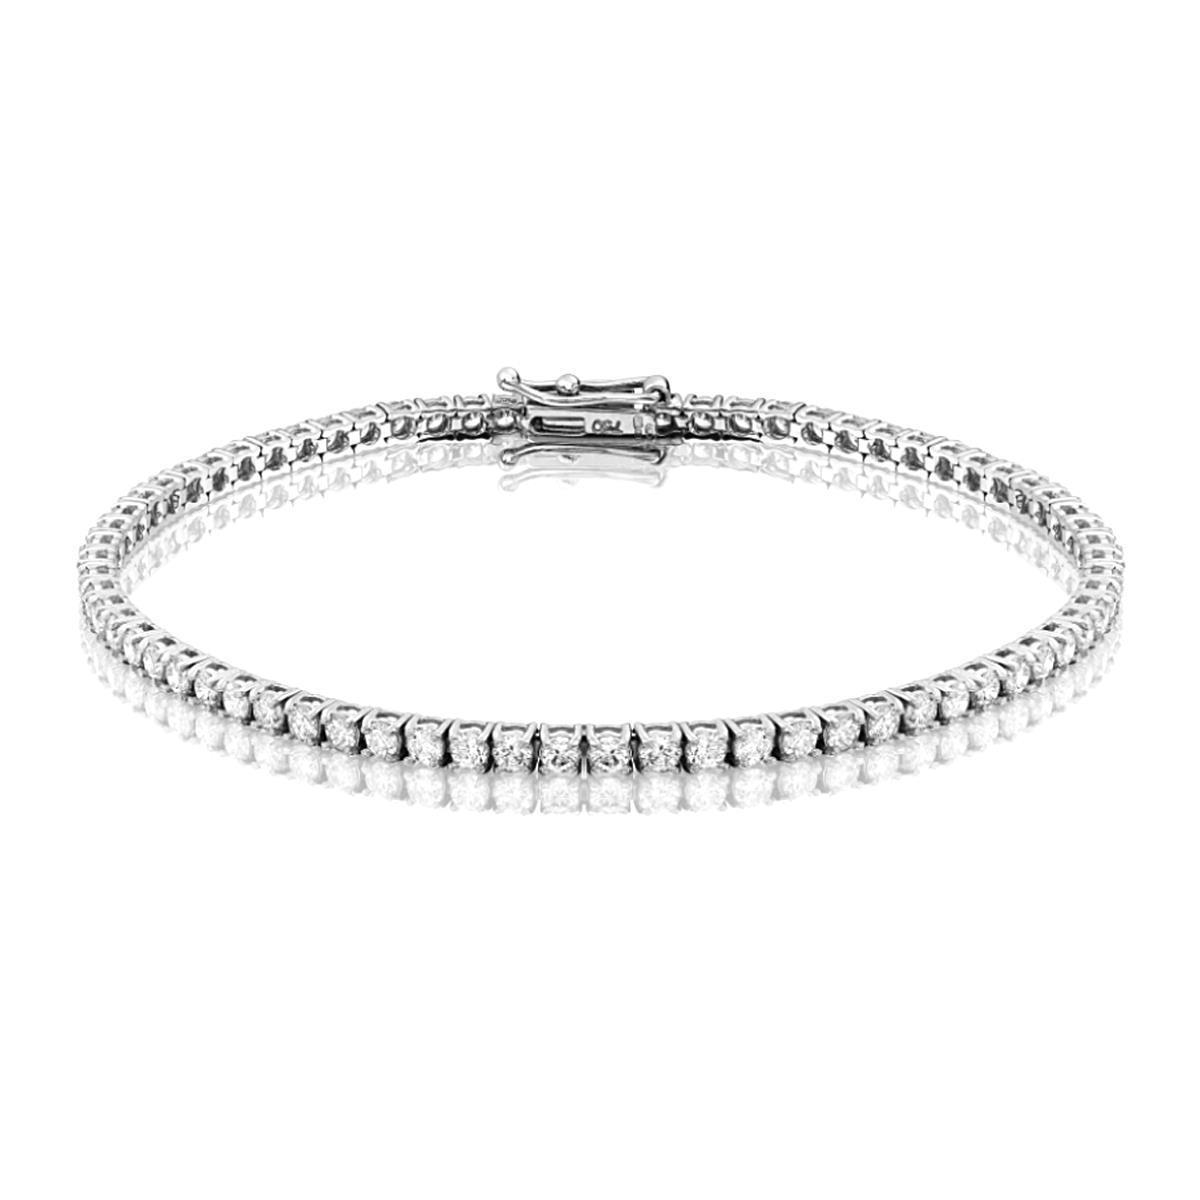 Radiance Collection 2.96ct Diamond Tennis Bracelet